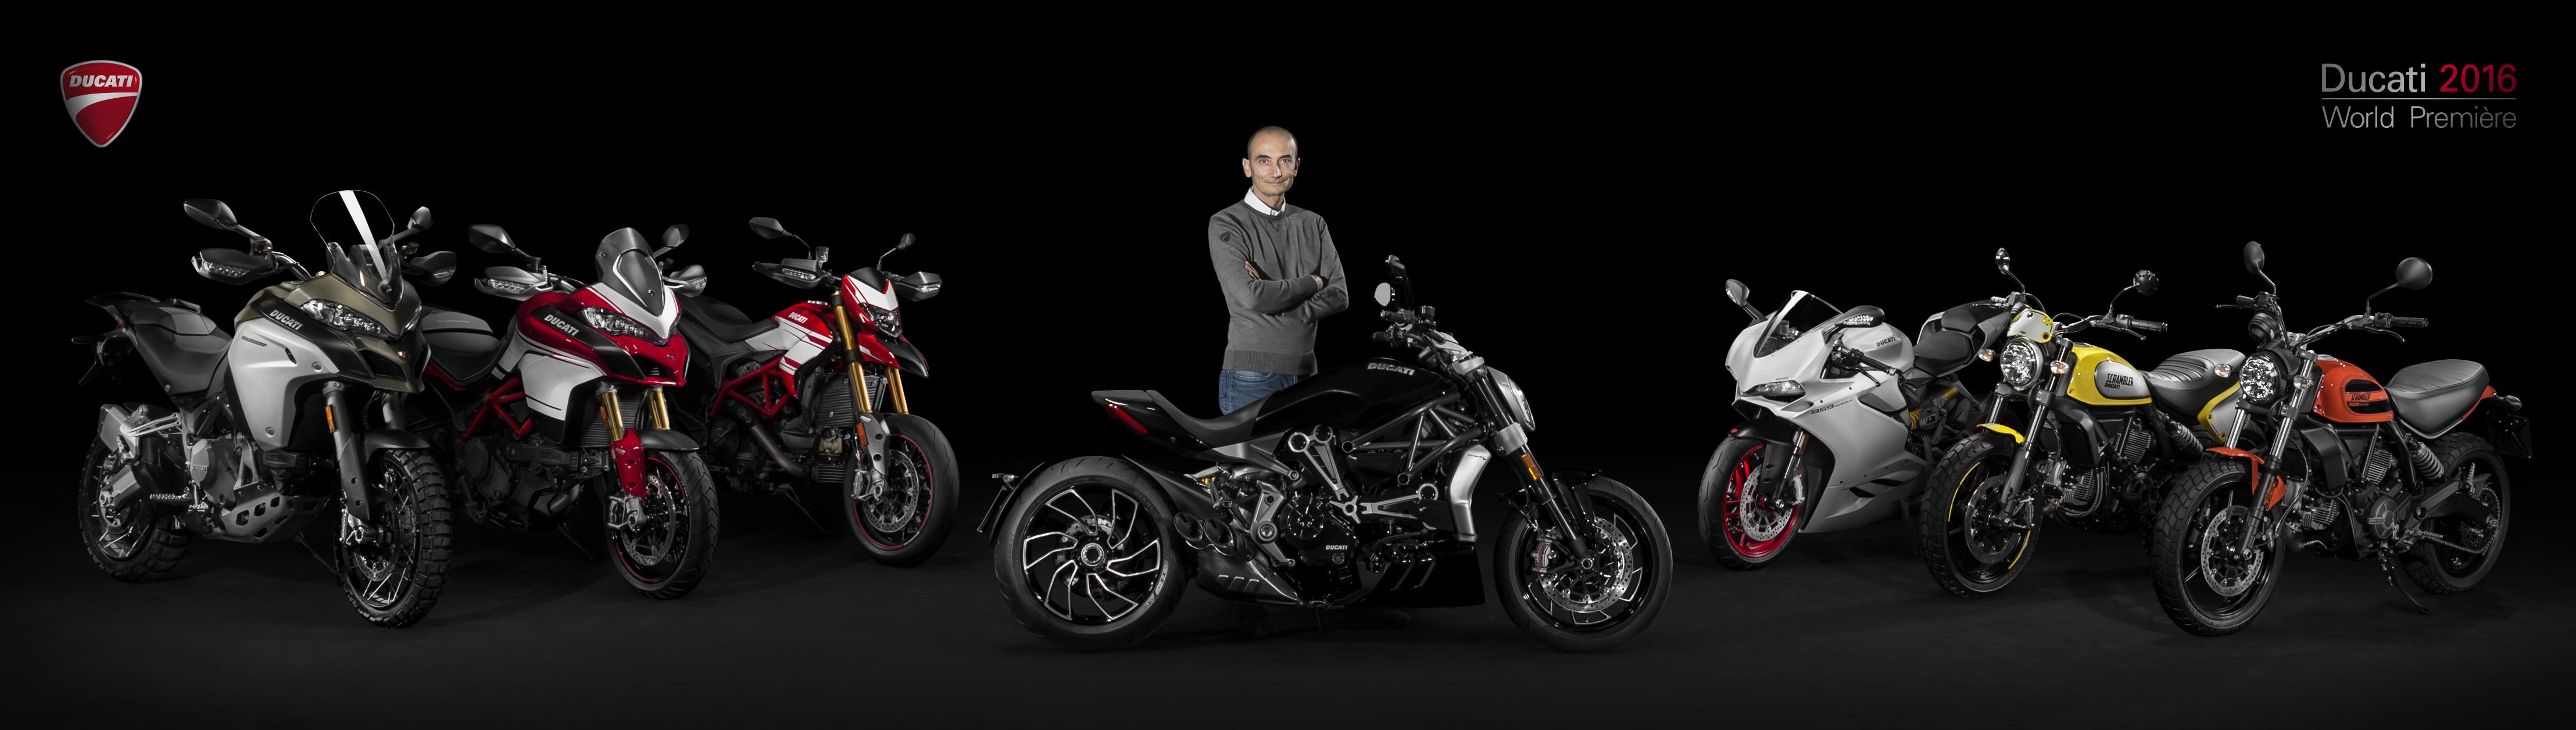 2016 Ducati Range Photo Gallery Autocar India